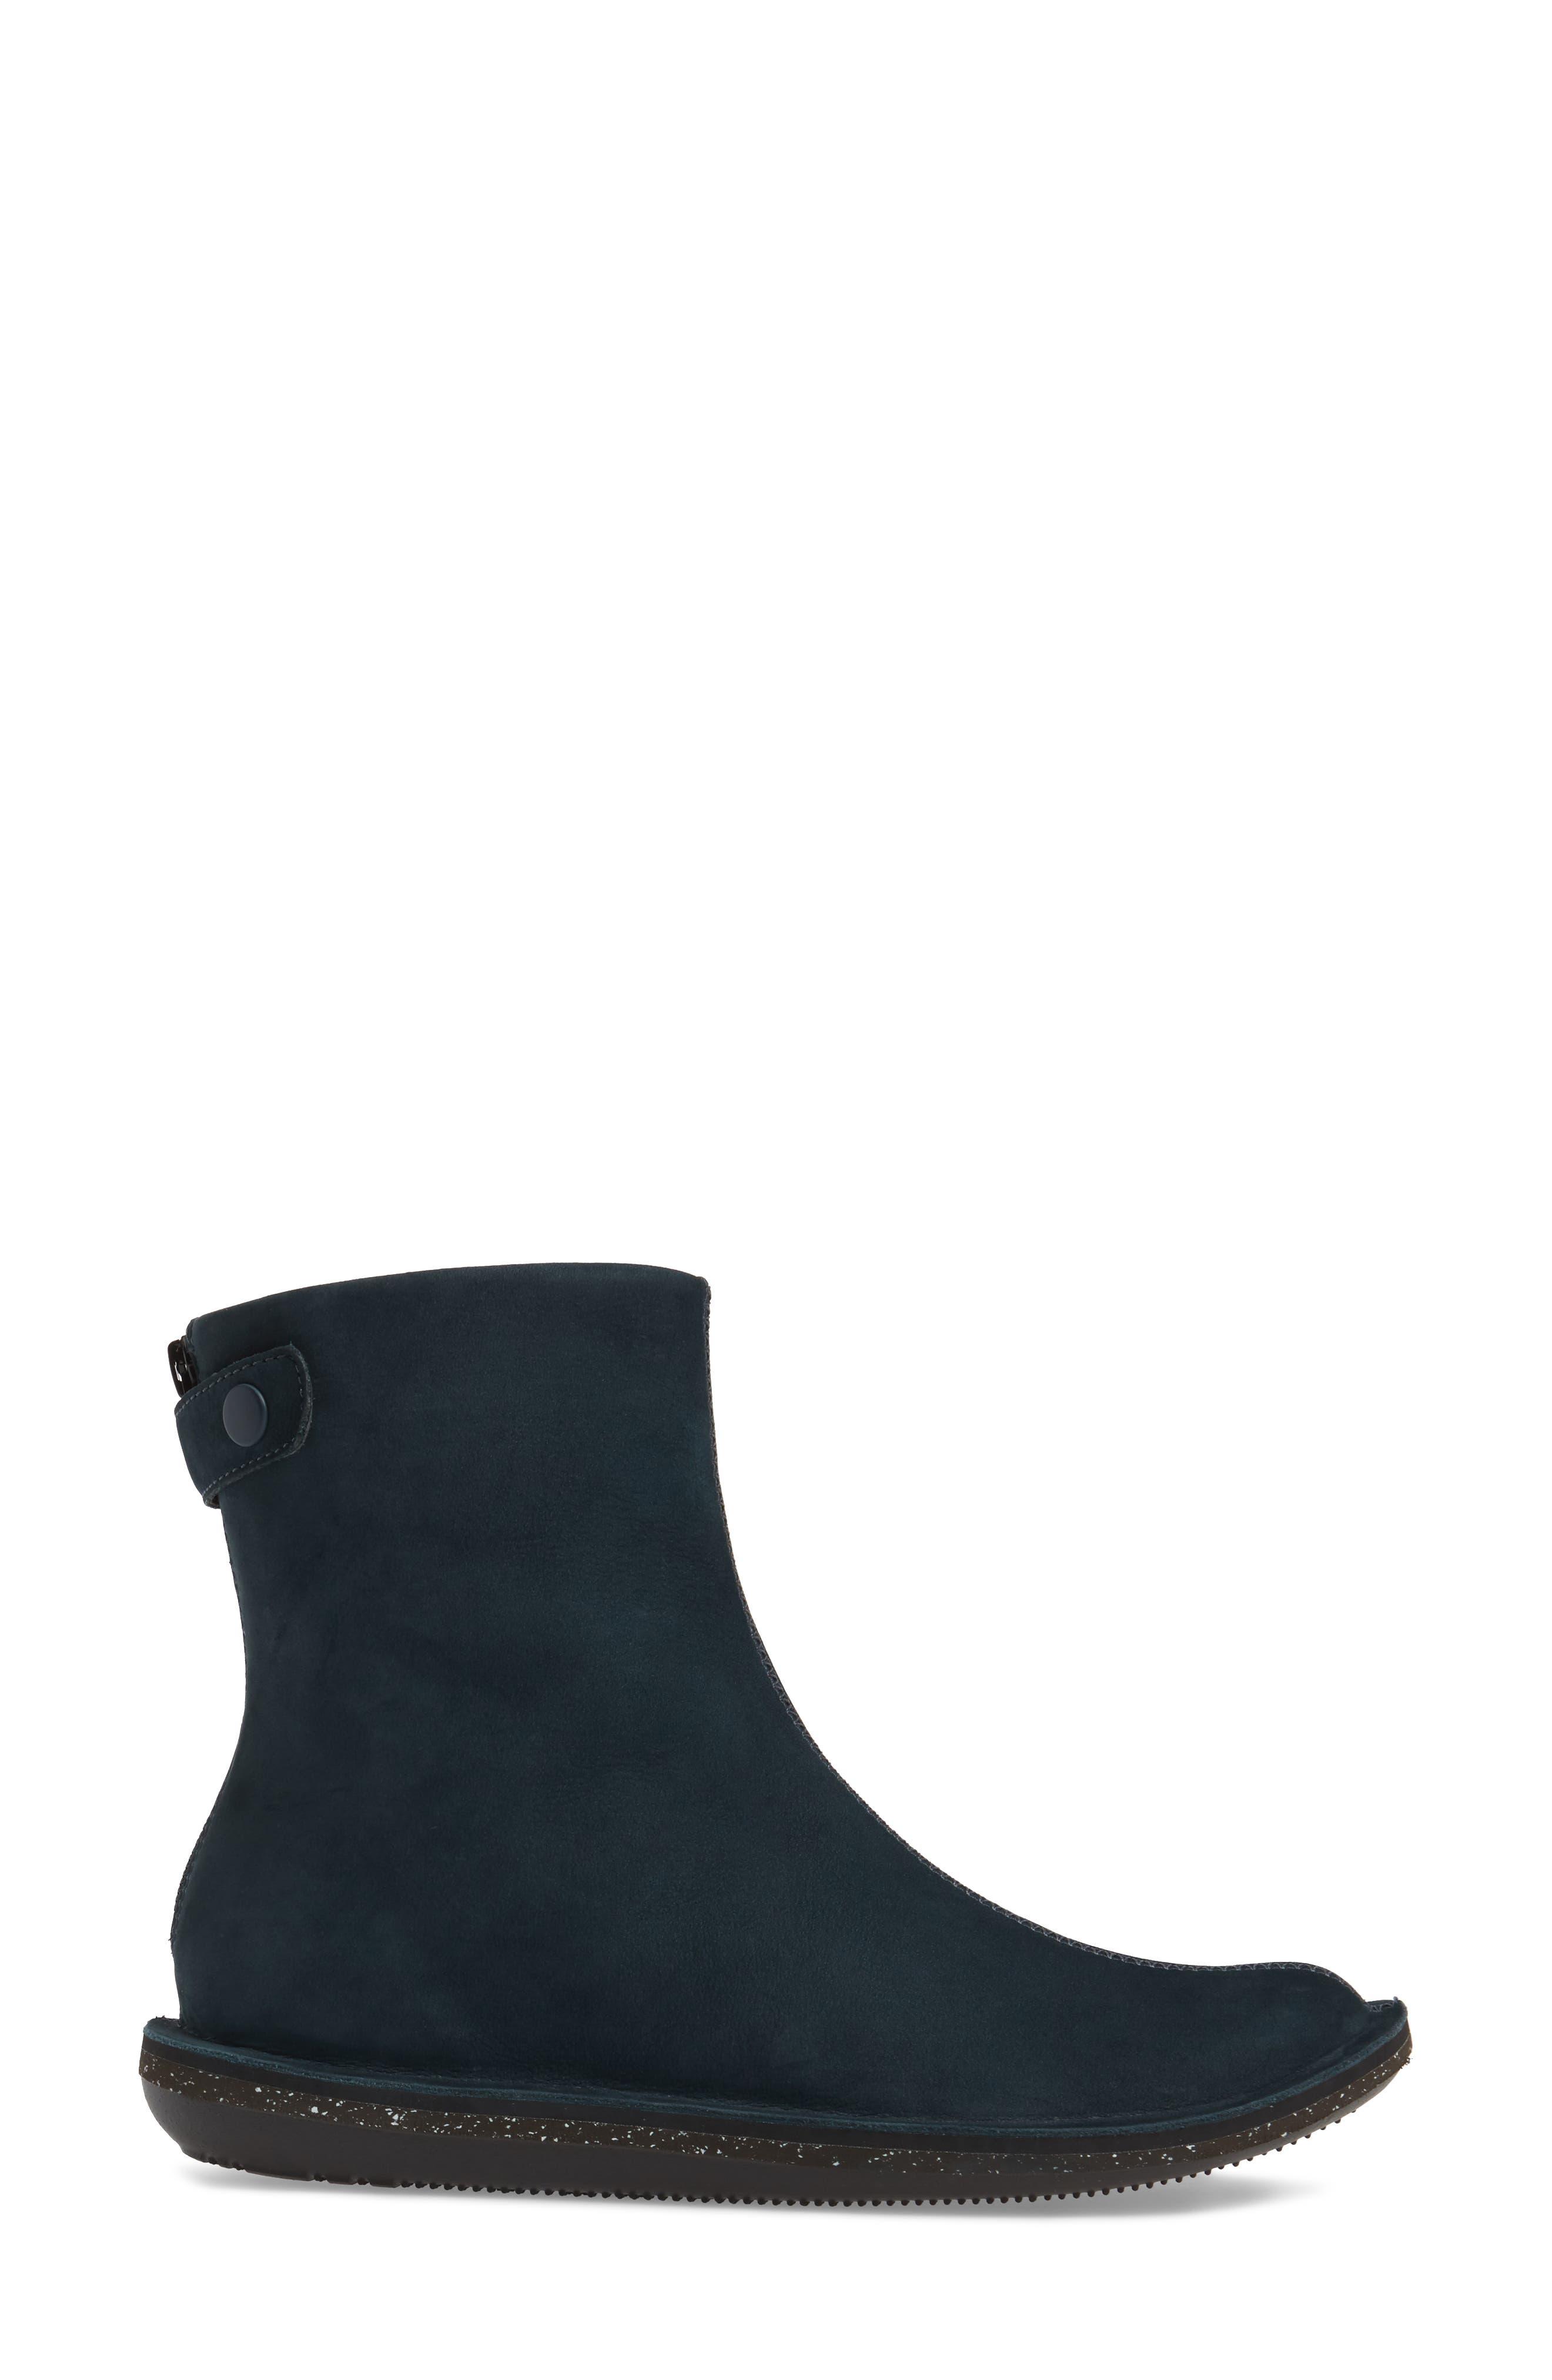 Alternate Image 3  - Camper 'Beetle Mid' Boot (Women)